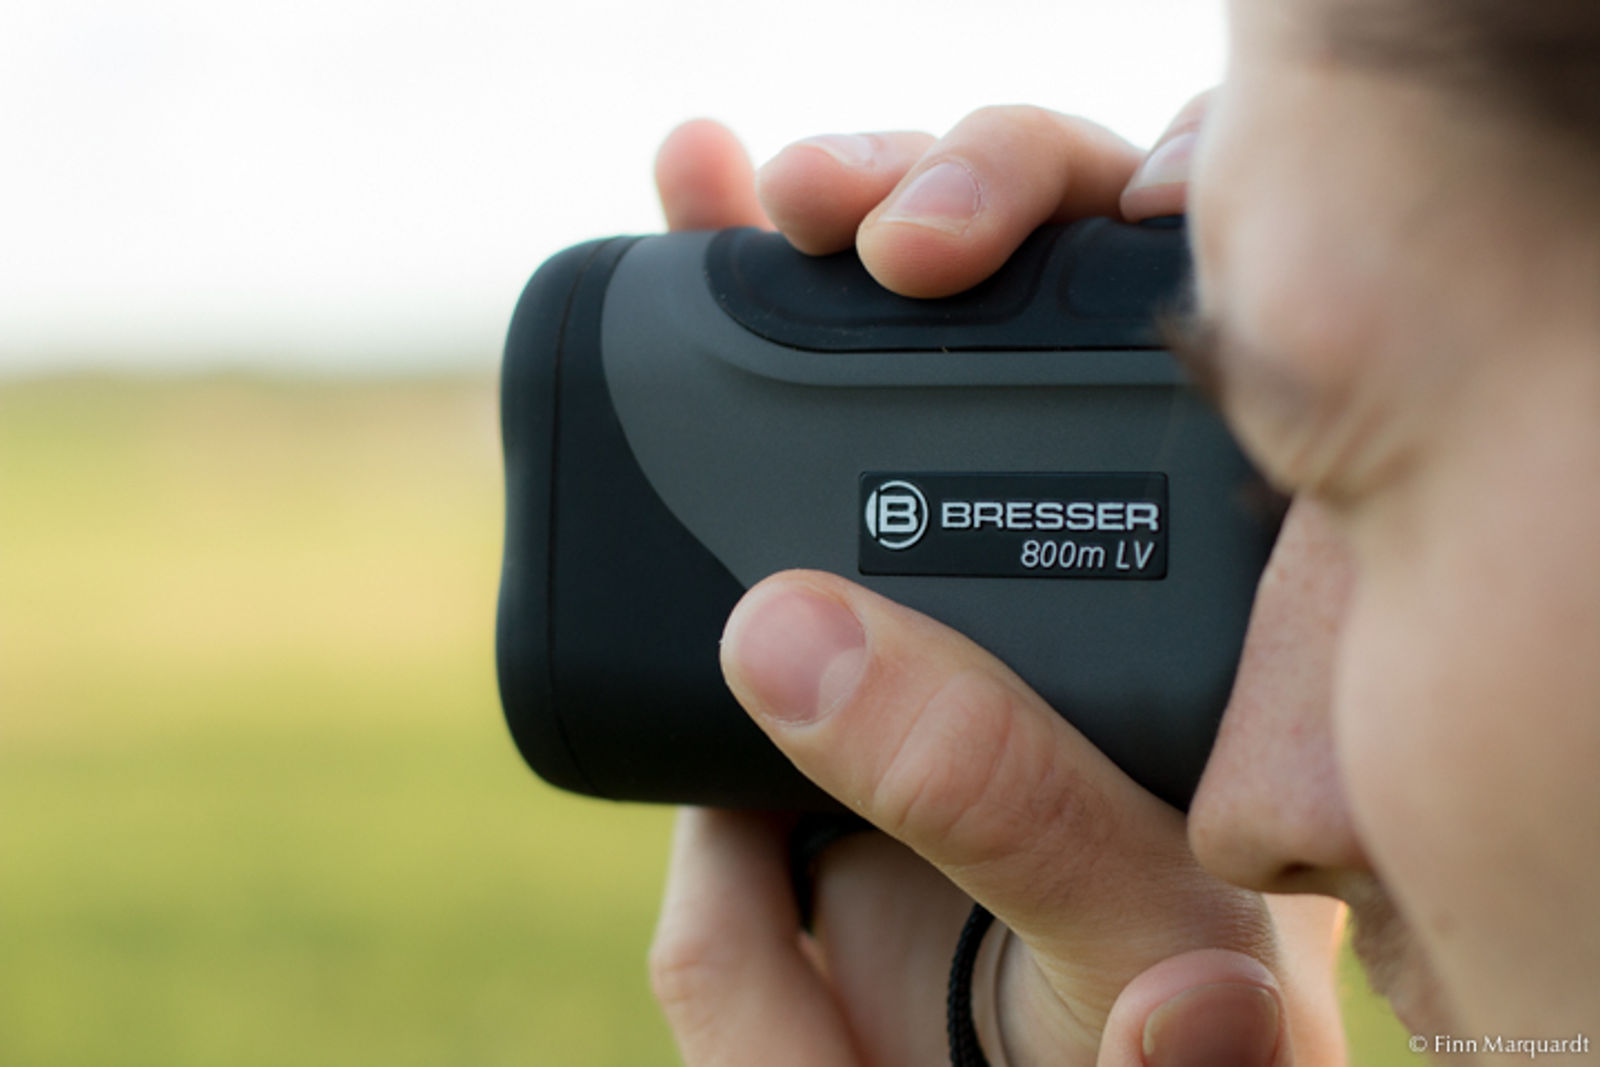 Test Bresser Entfernungsmesser : Entfernungsmesser 800 m lv laserentfernungsmesser von bresser